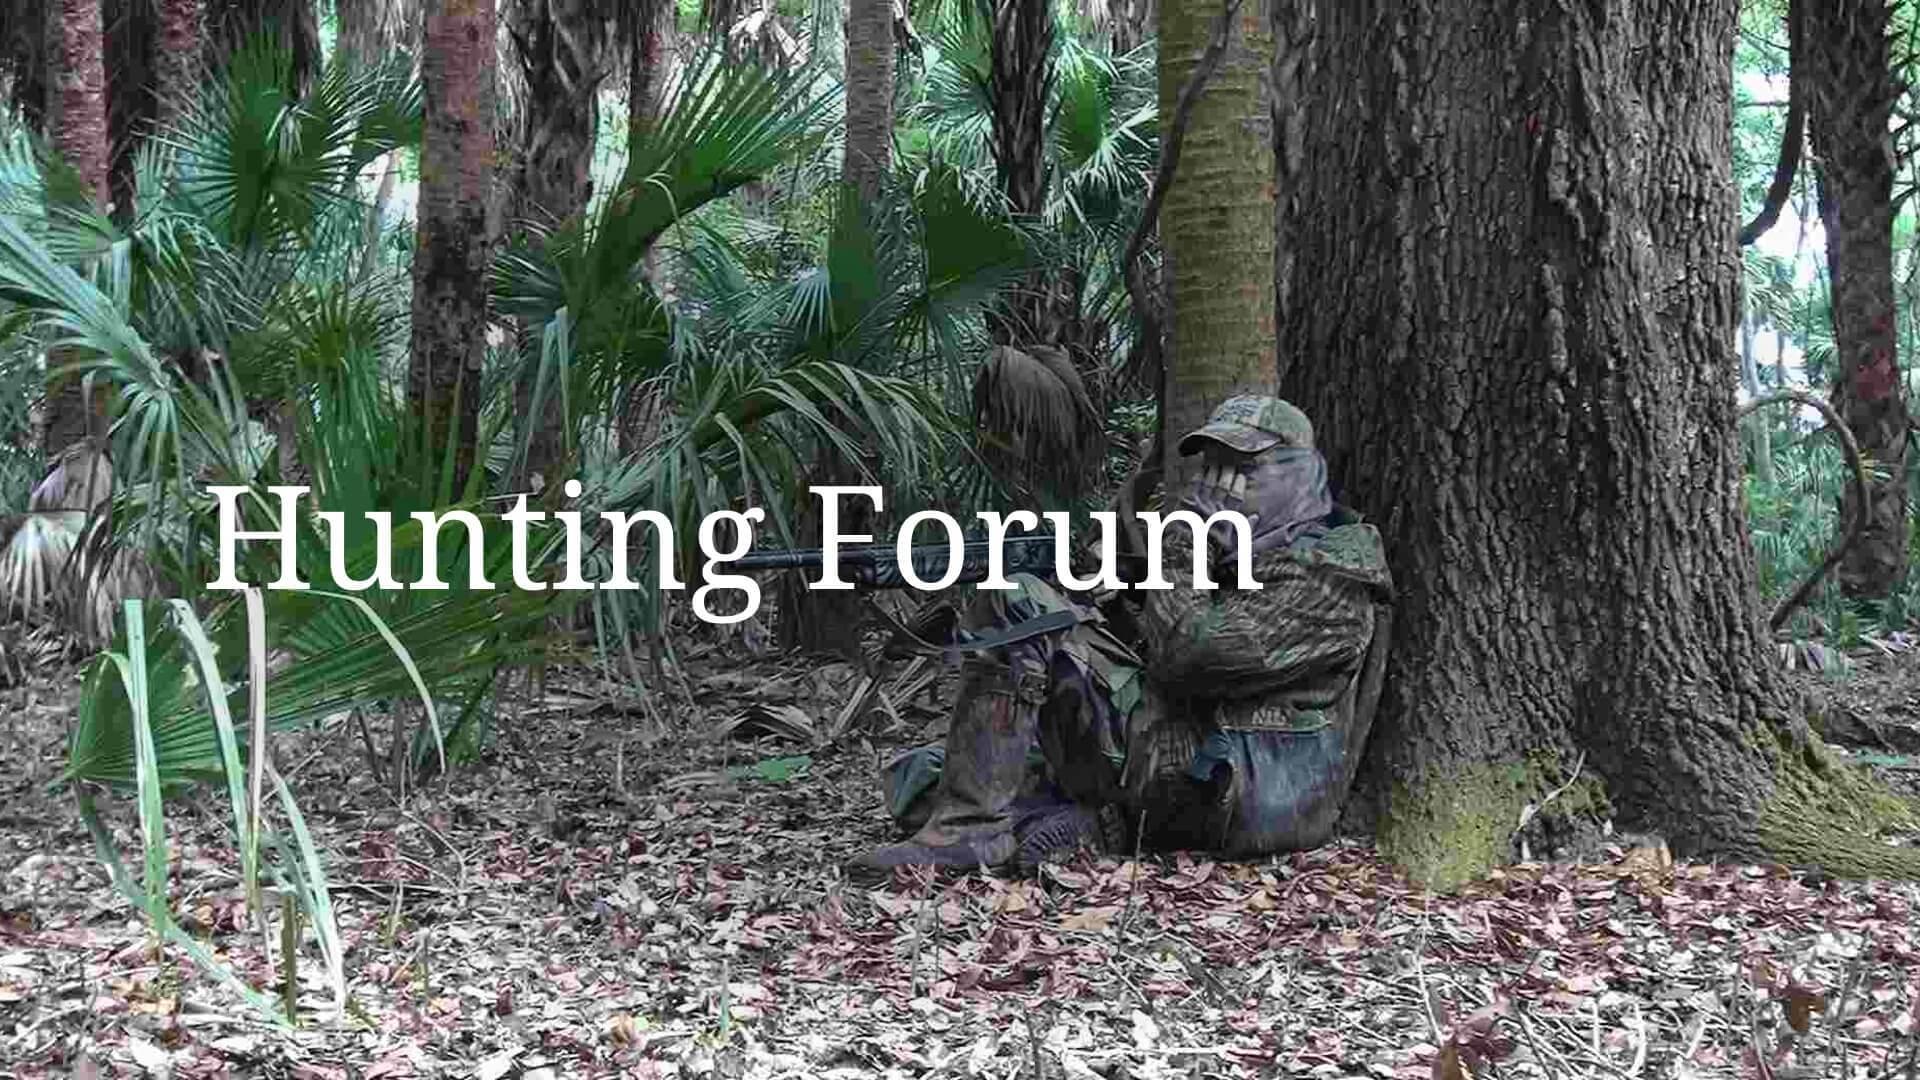 Hunting Forum